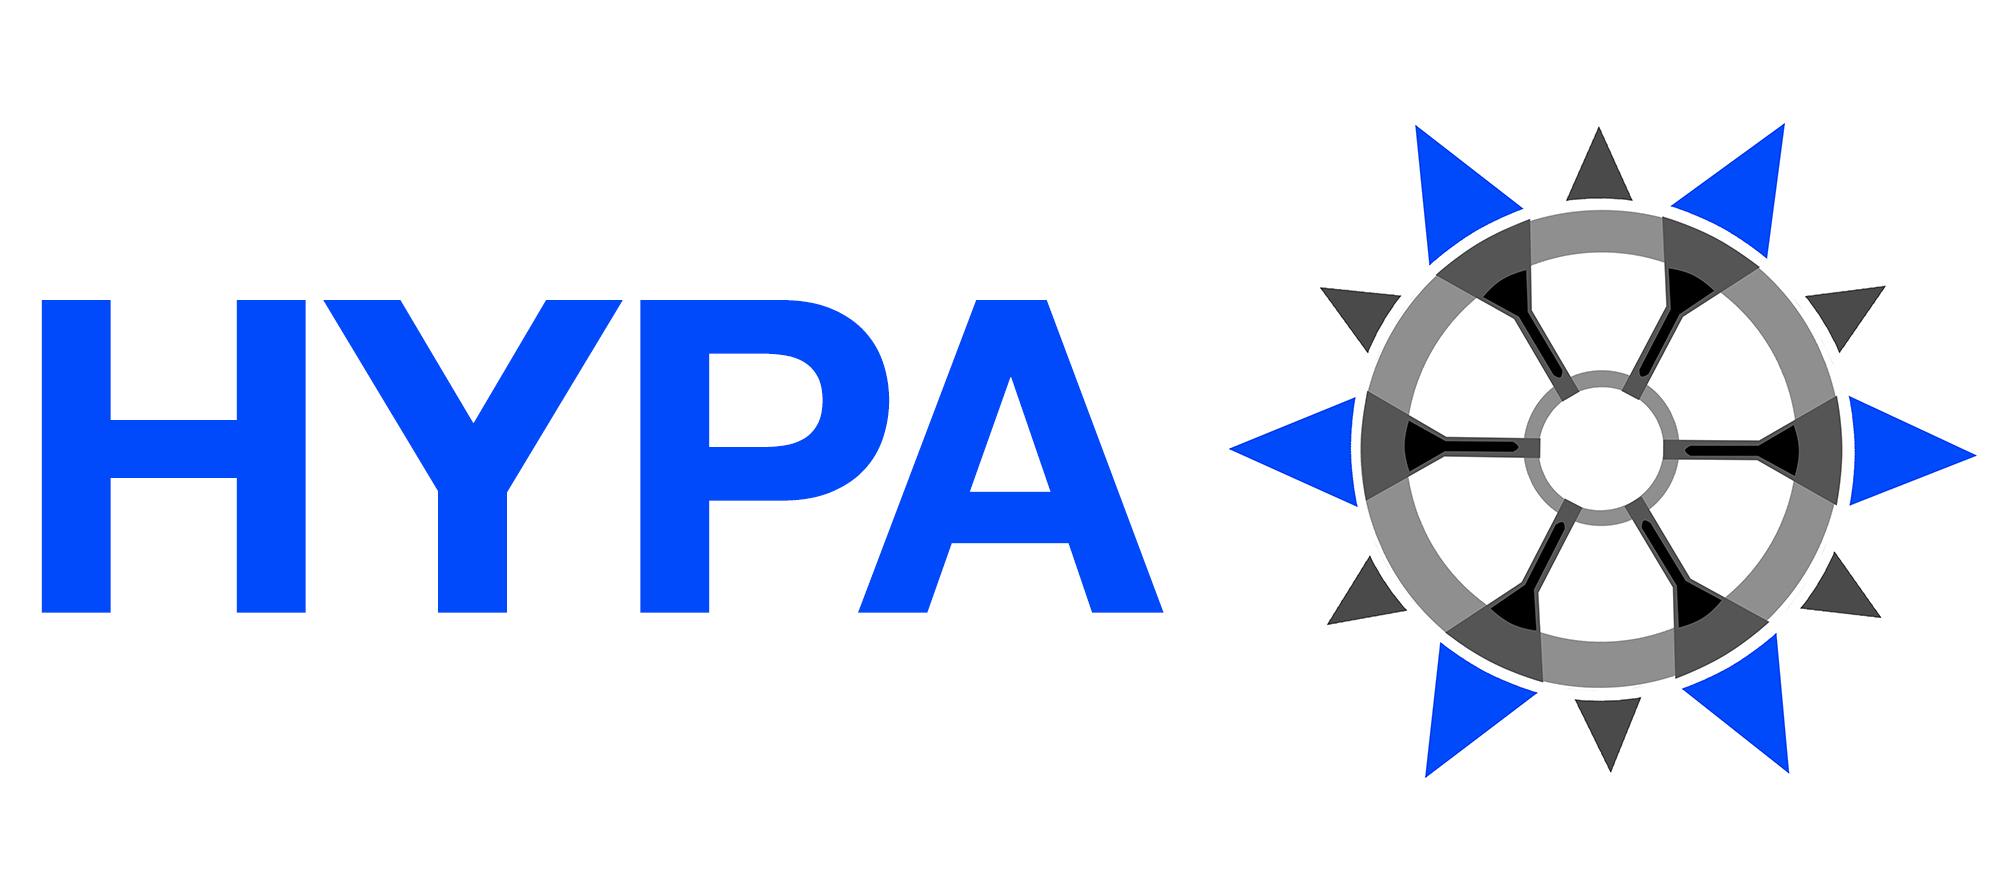 6.5 inch URBAN Treads Tyres WITH HYPA Hub Custom.